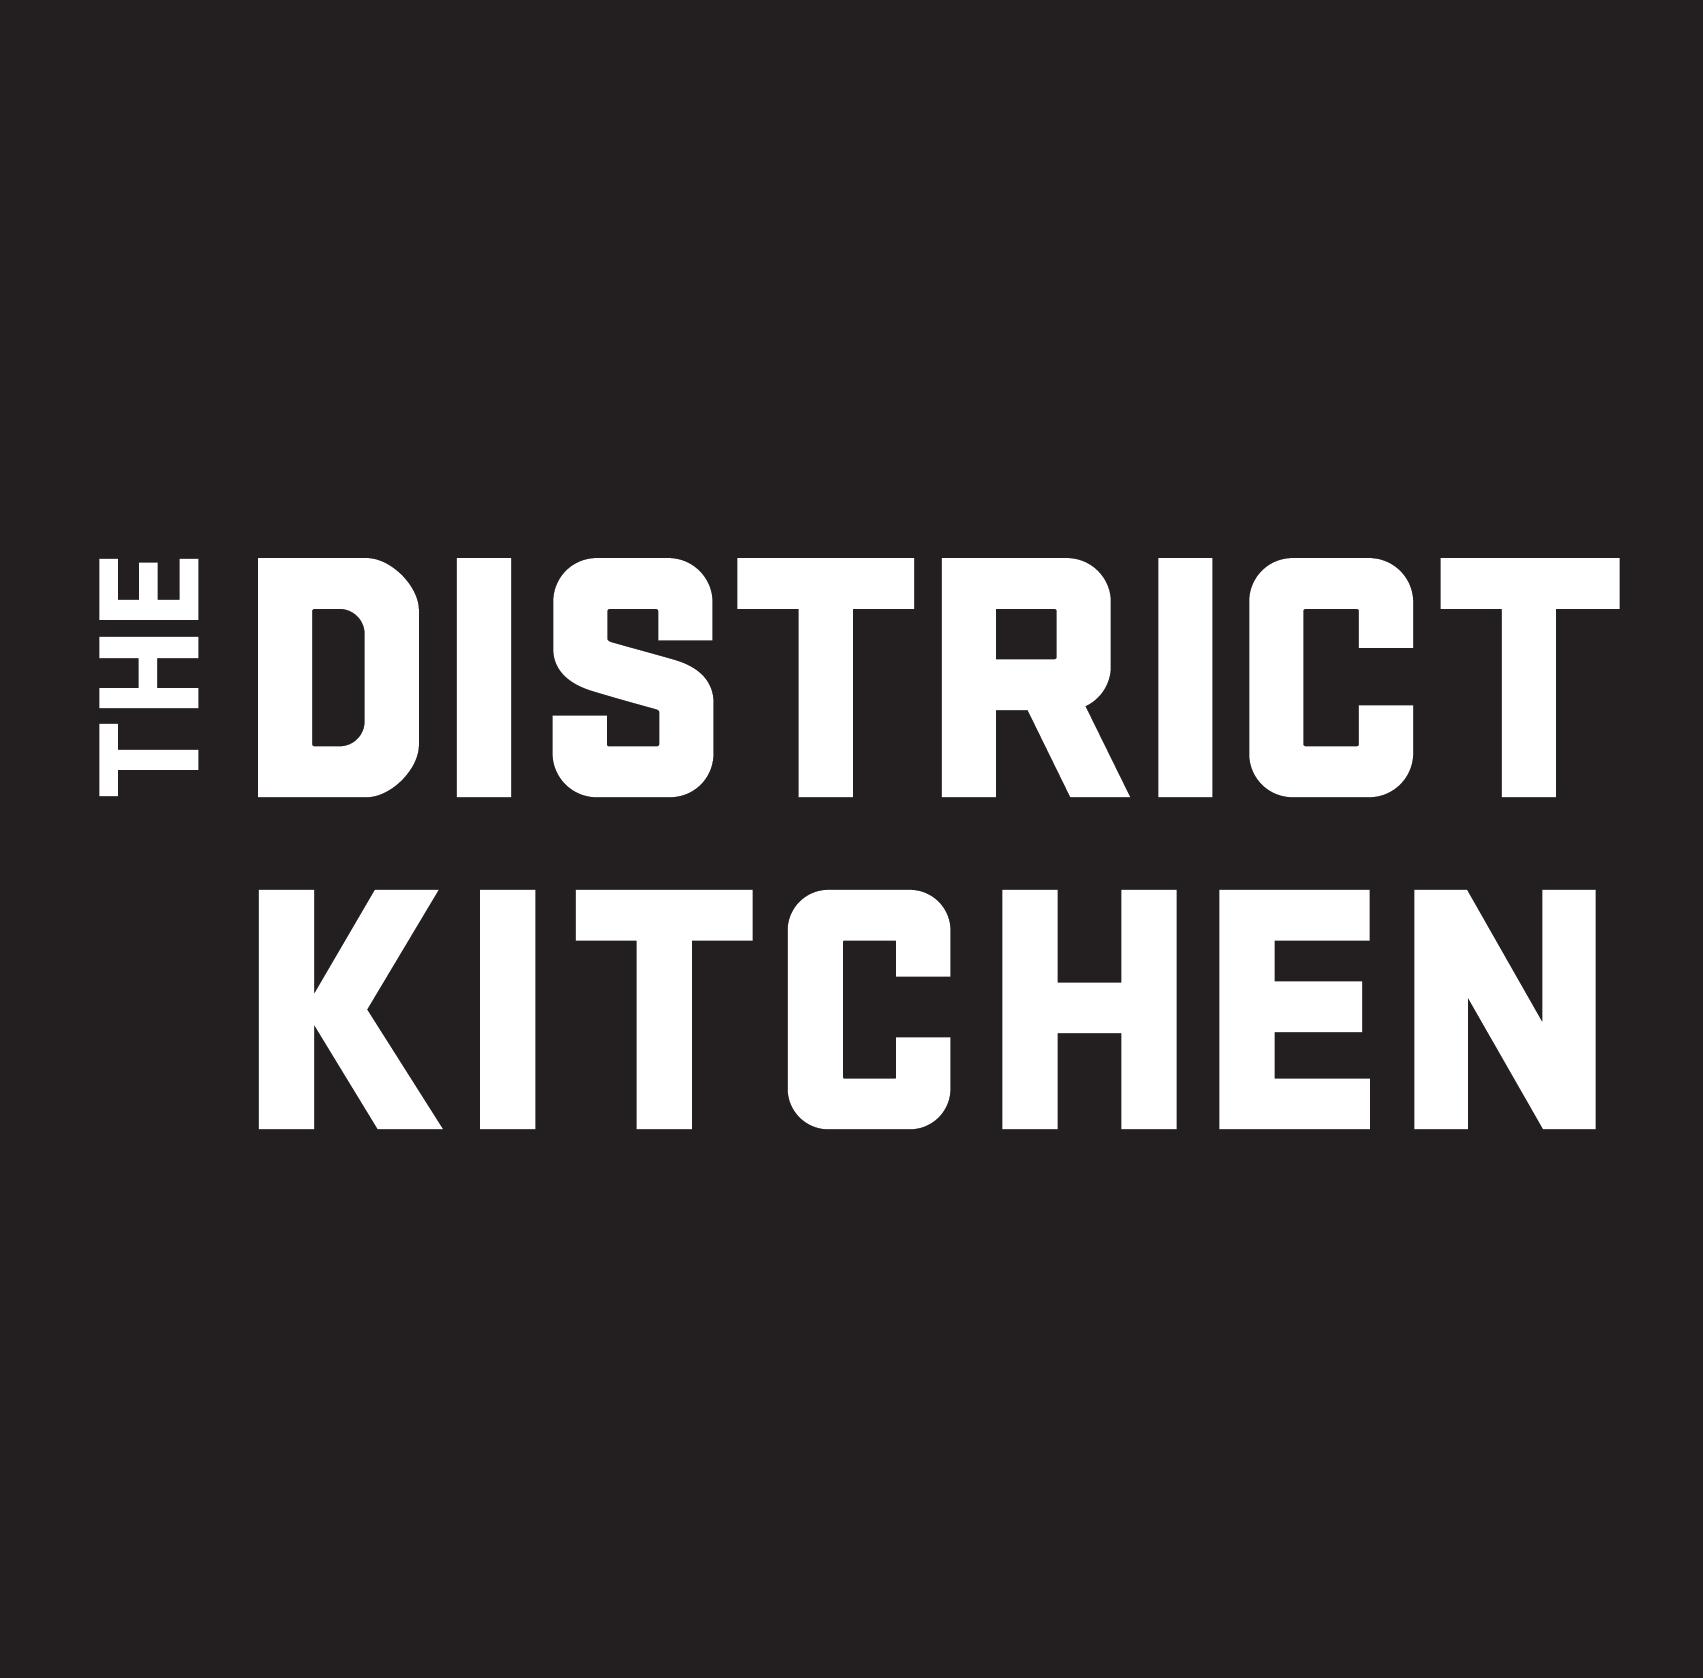 The District Kitchen logo